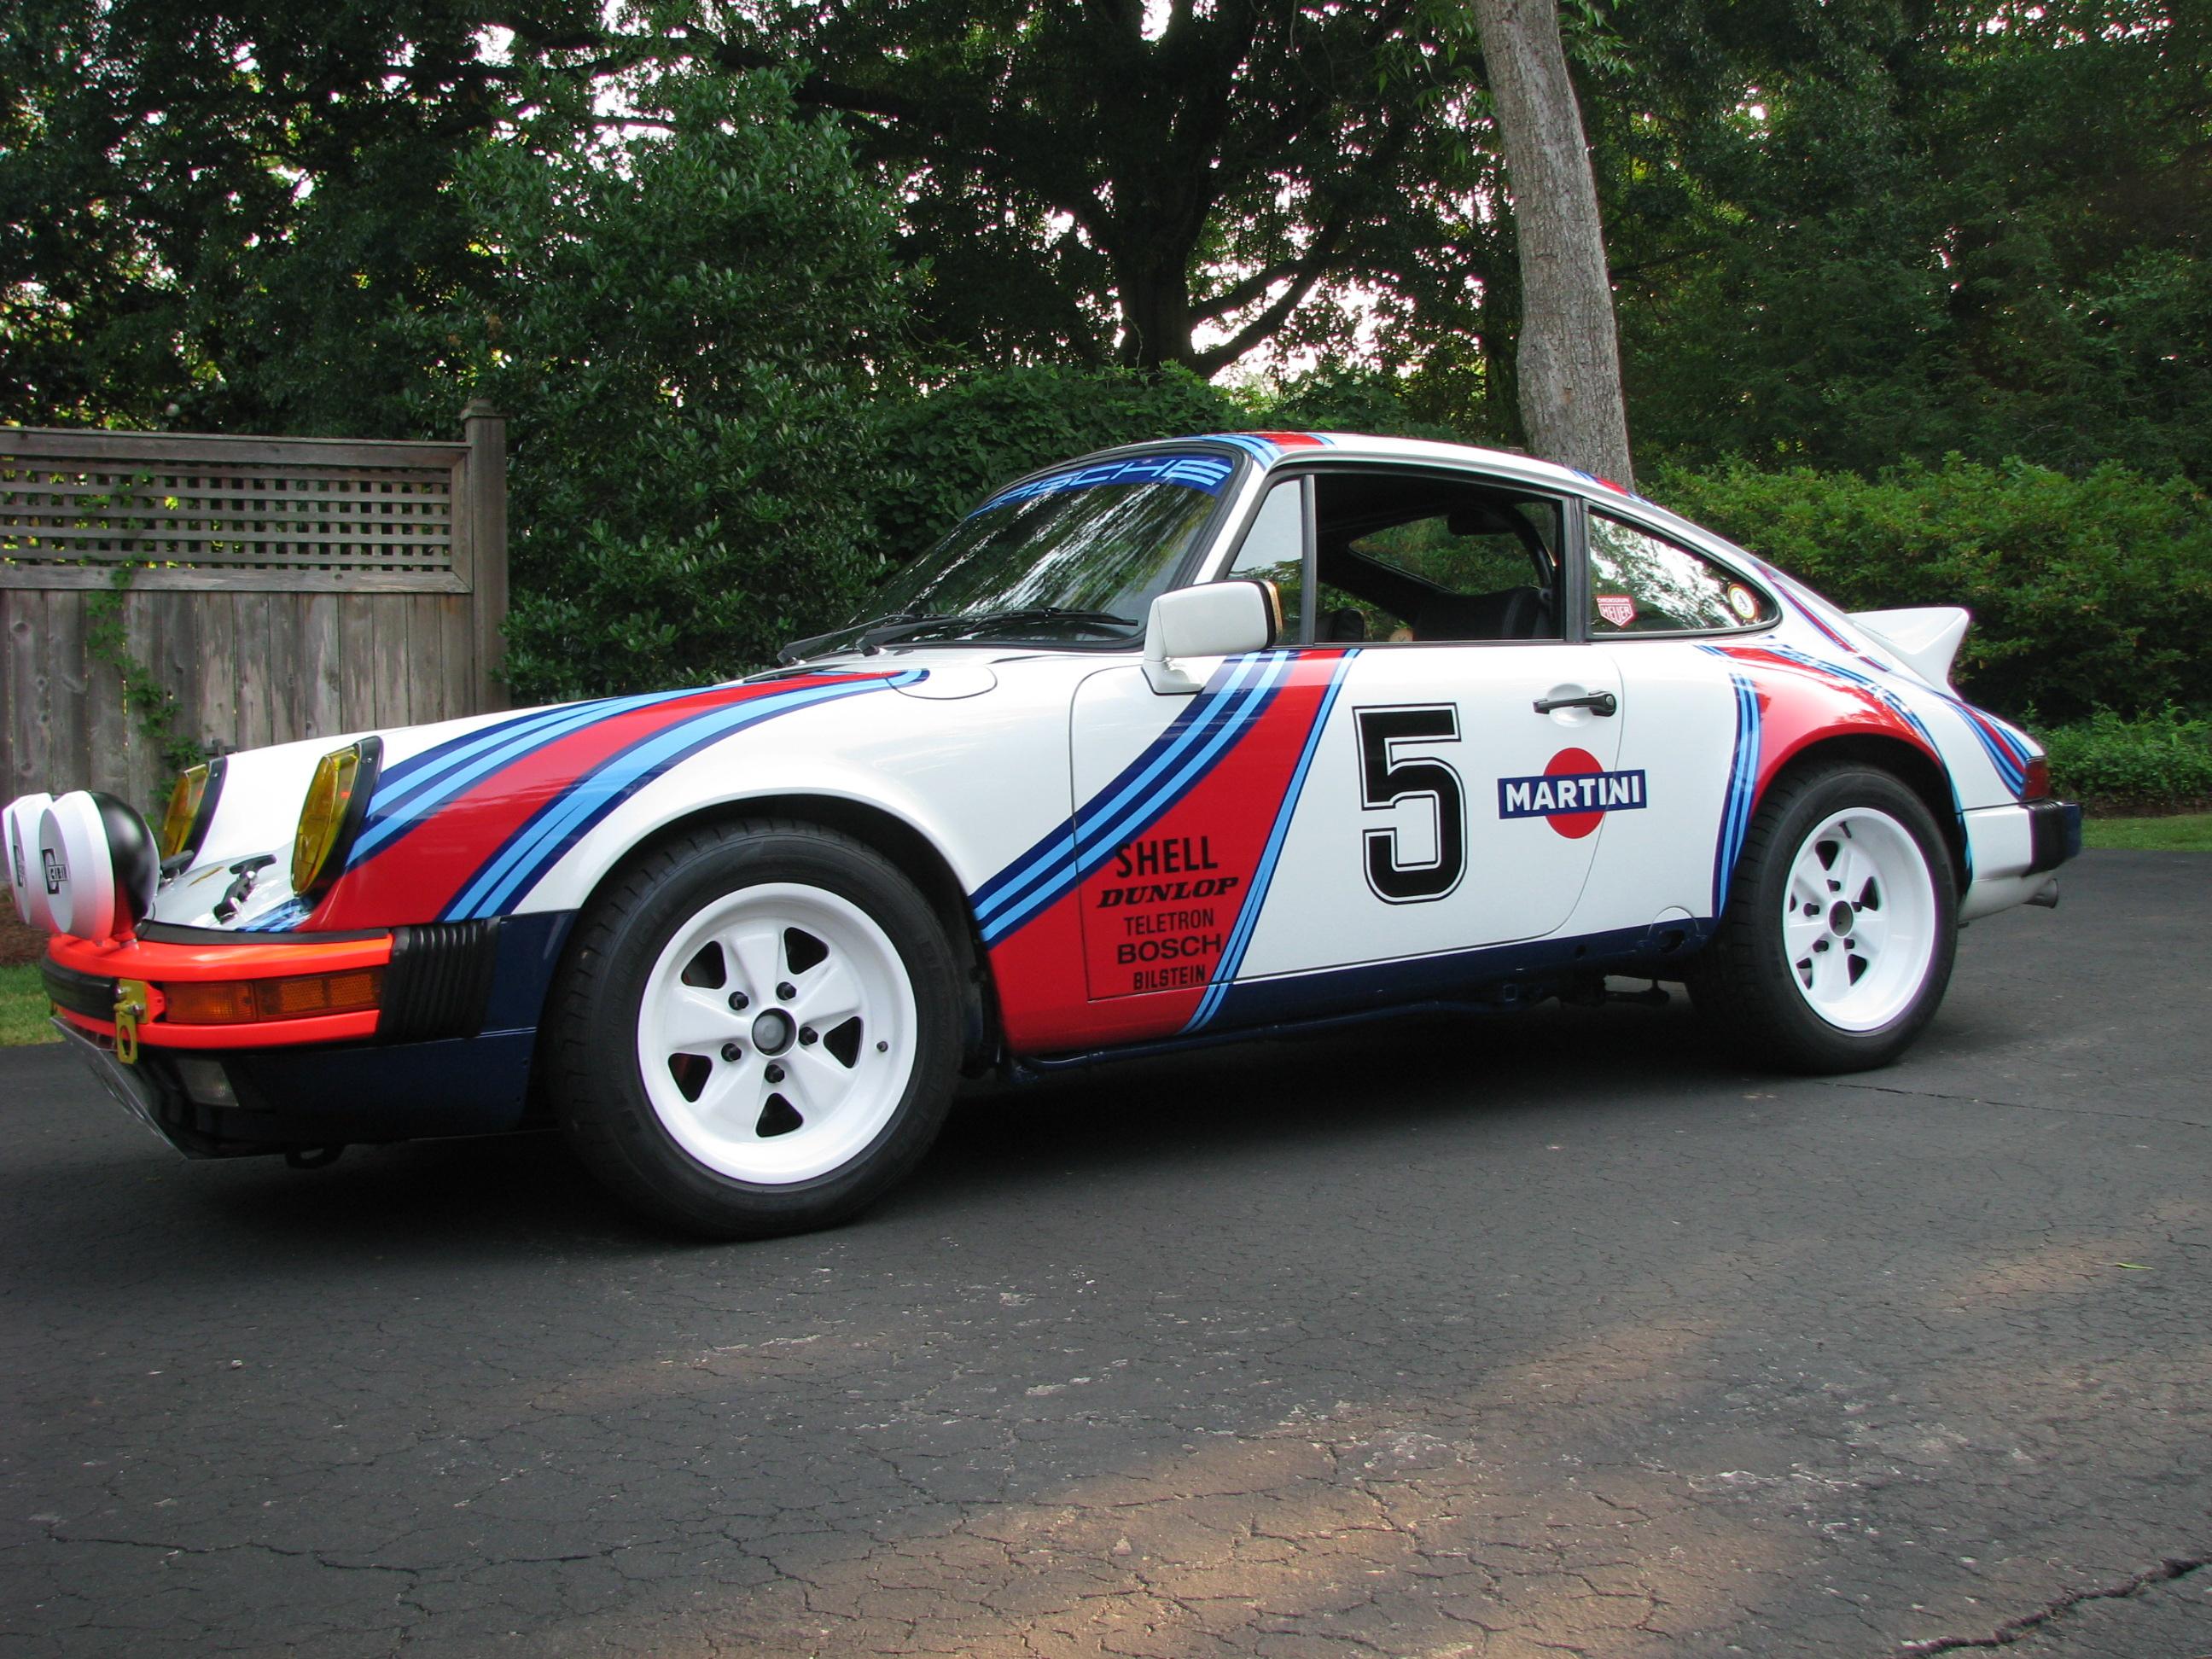 martini racing inspired porsche carrera rally car. Black Bedroom Furniture Sets. Home Design Ideas